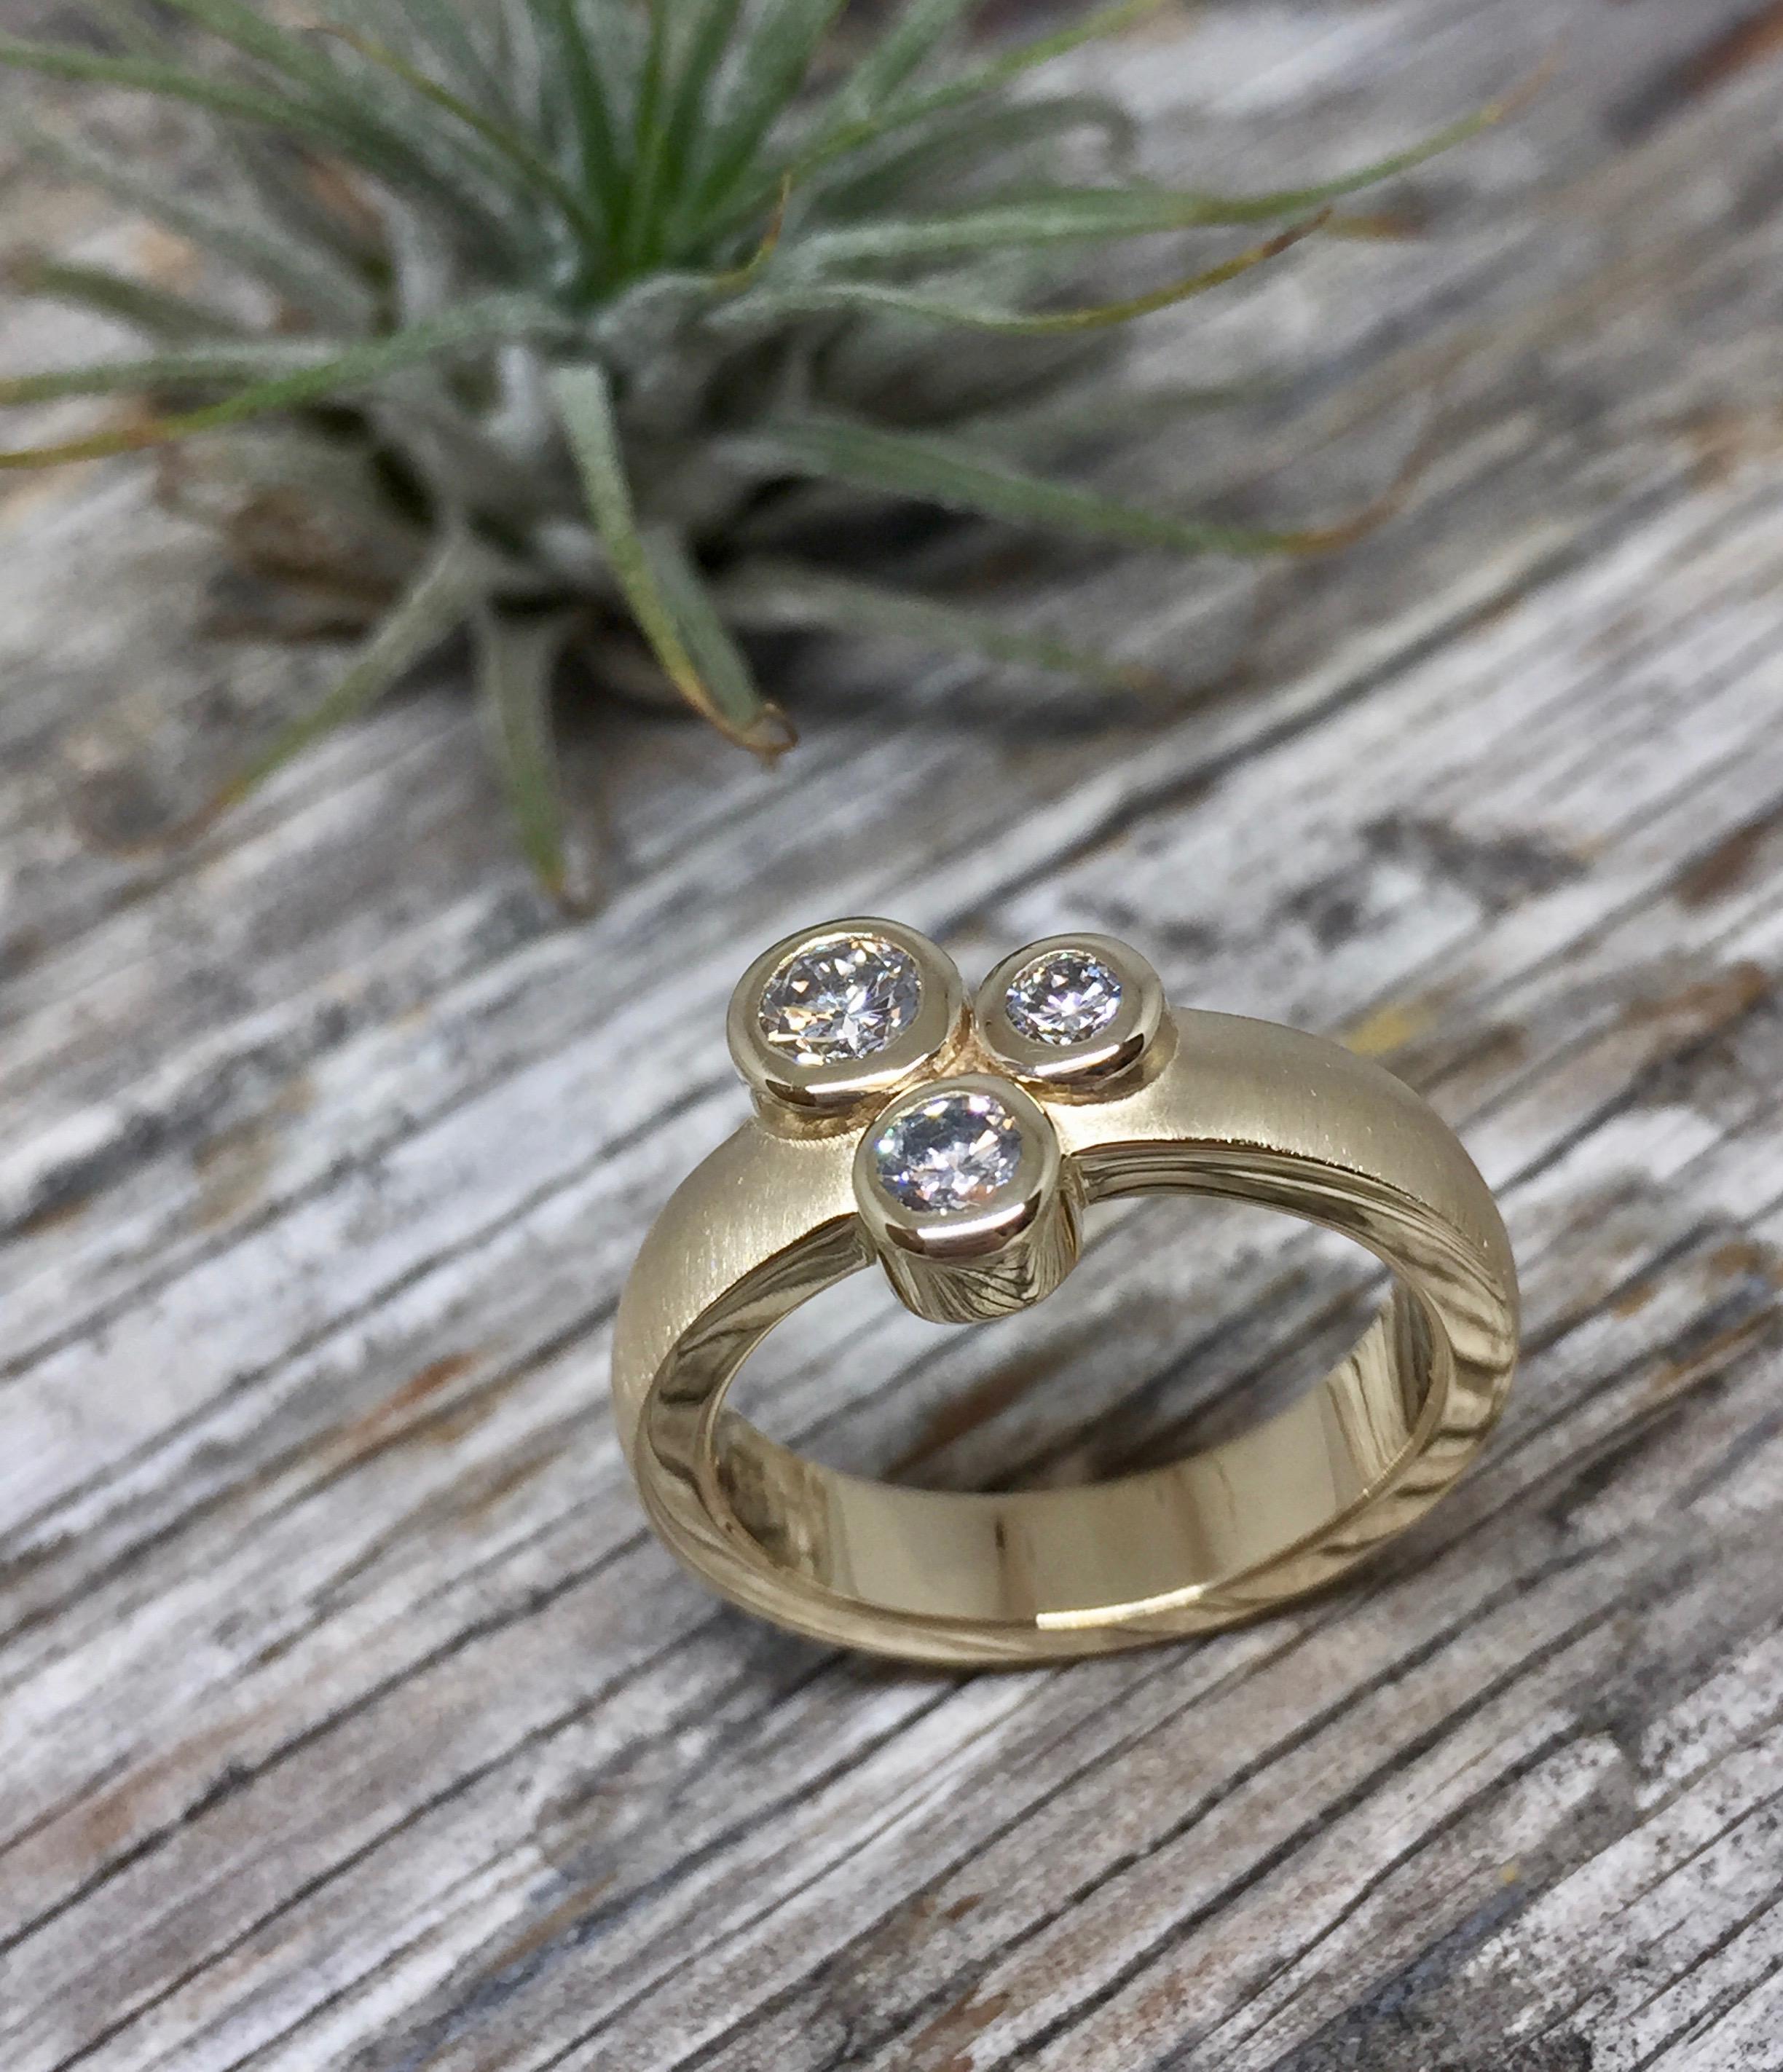 verena-strigler-diamond--three-stone-ring-yellow-gold-vancouver.jpg